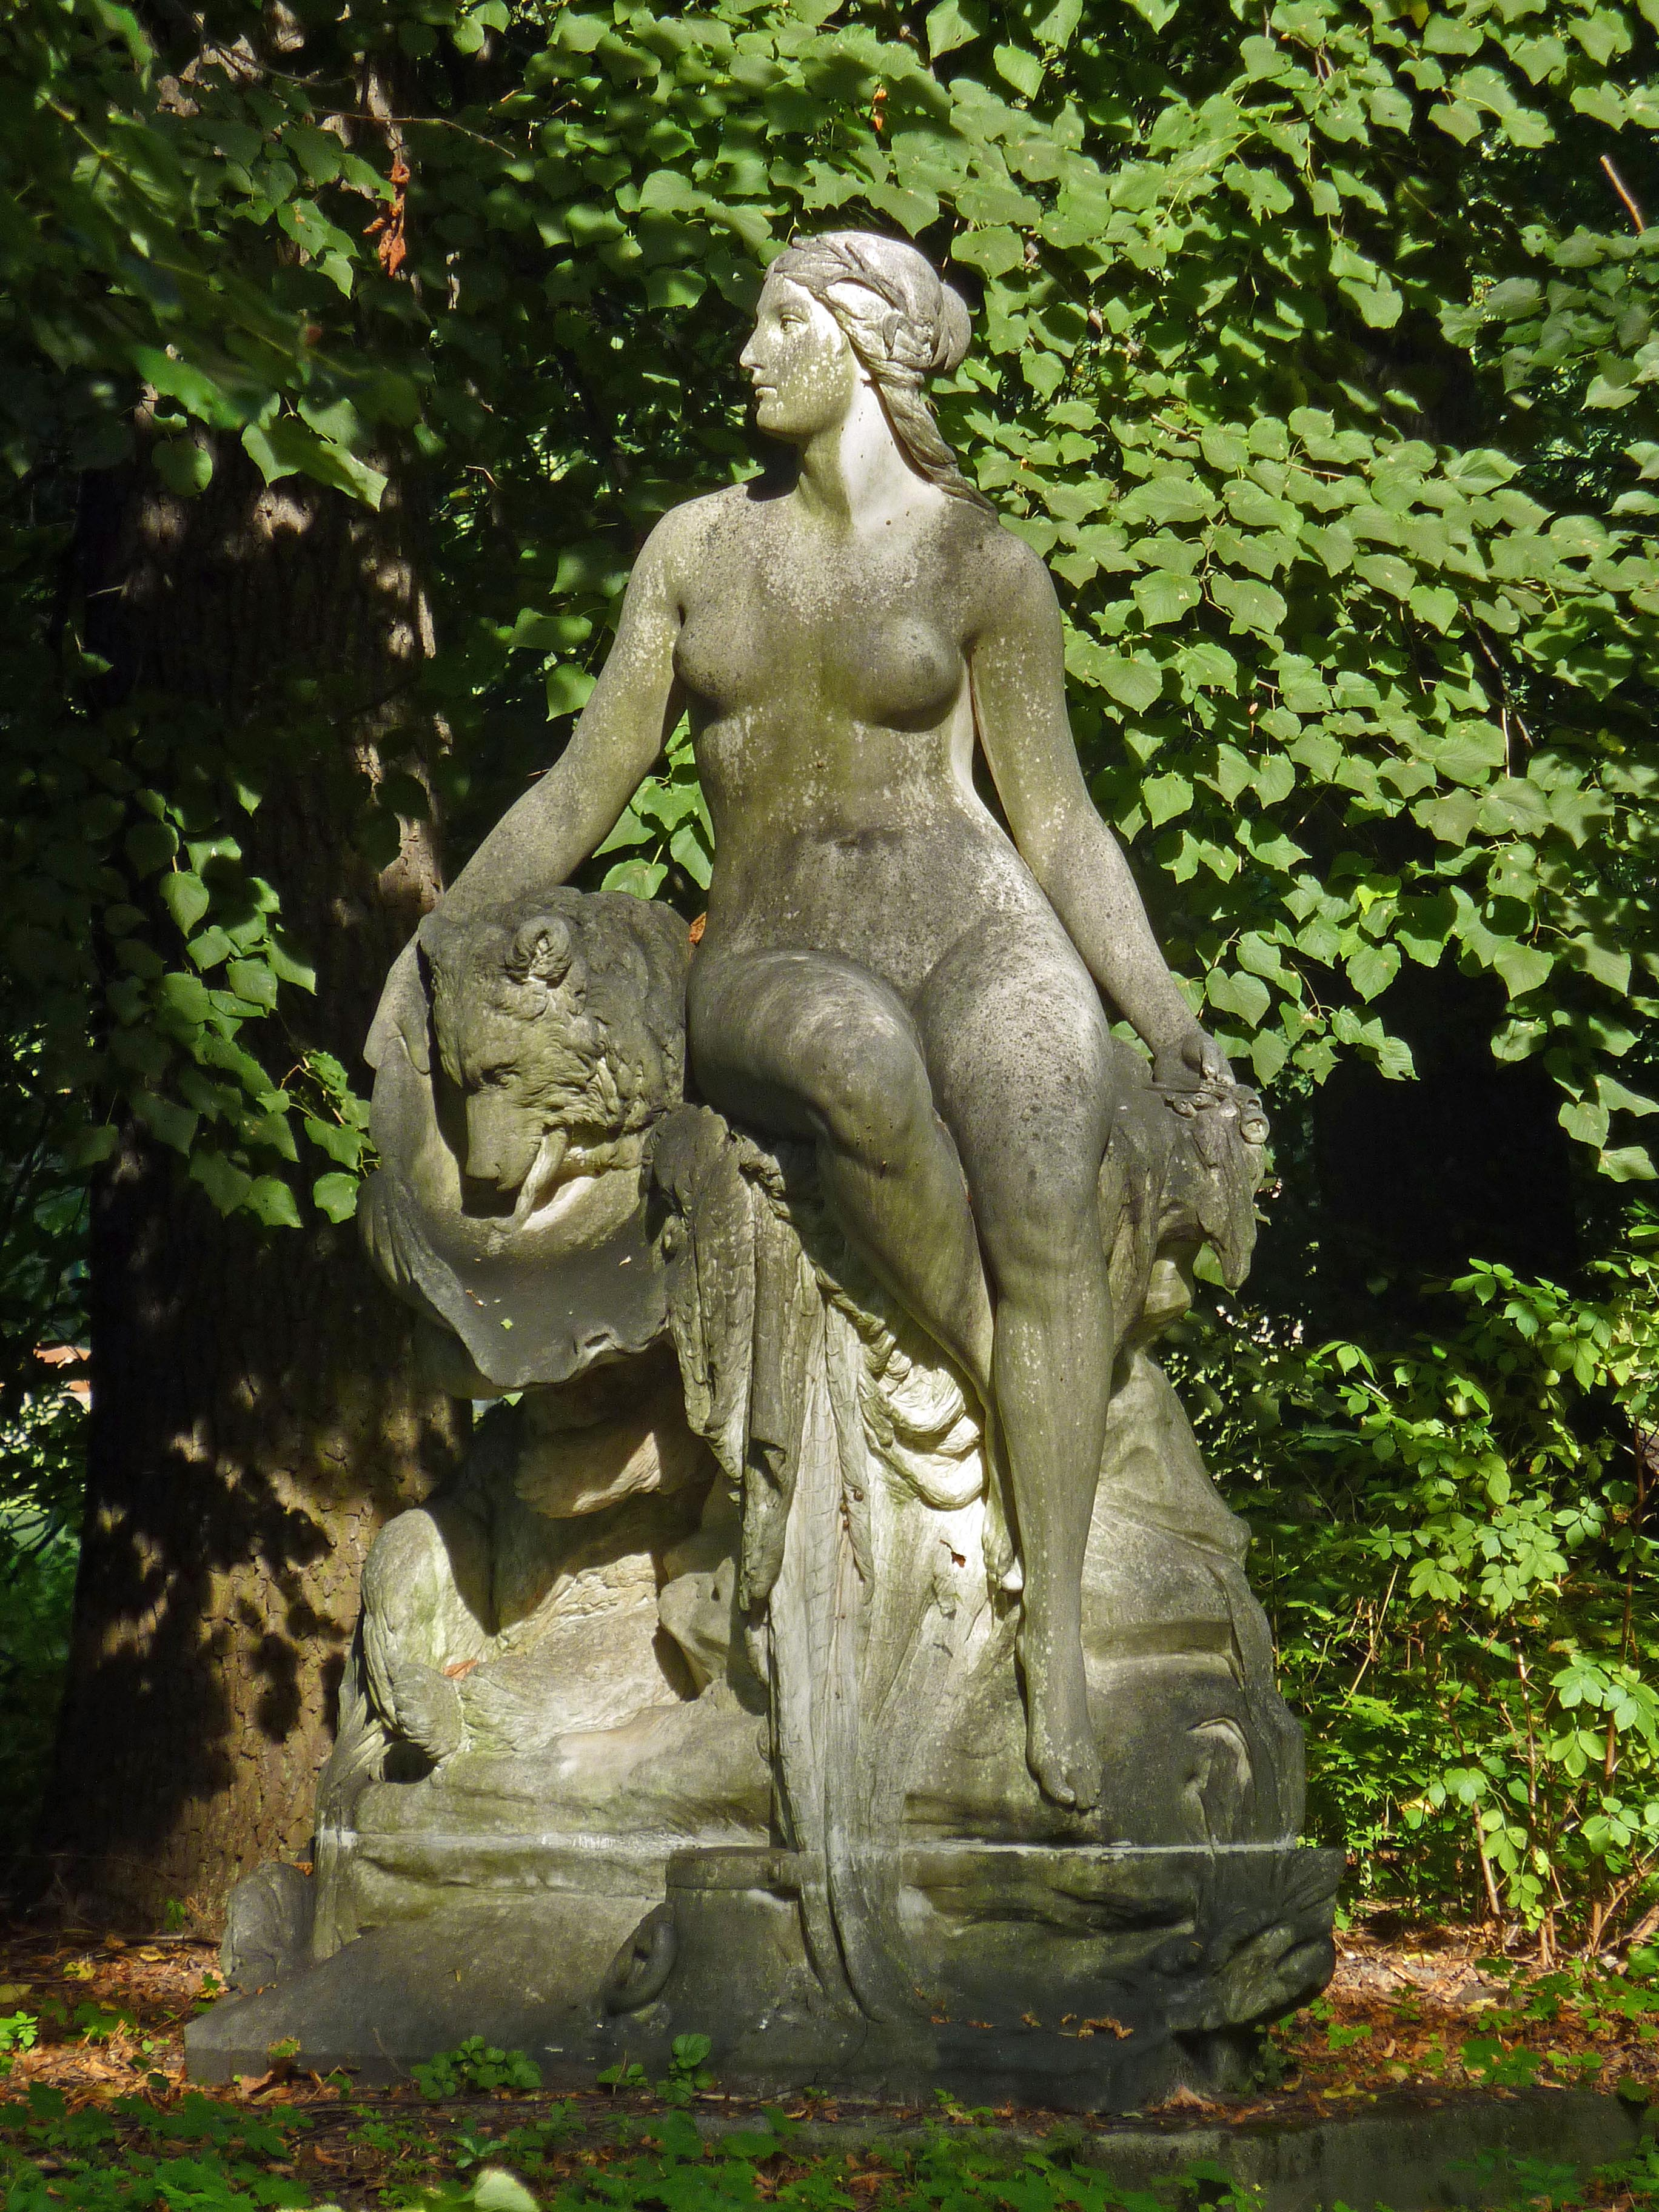 https://upload.wikimedia.org/wikipedia/commons/0/07/Sprea%2C_Jeremias_Christensen%2C_Tierpark_Berlin%2C_531-637.jpg